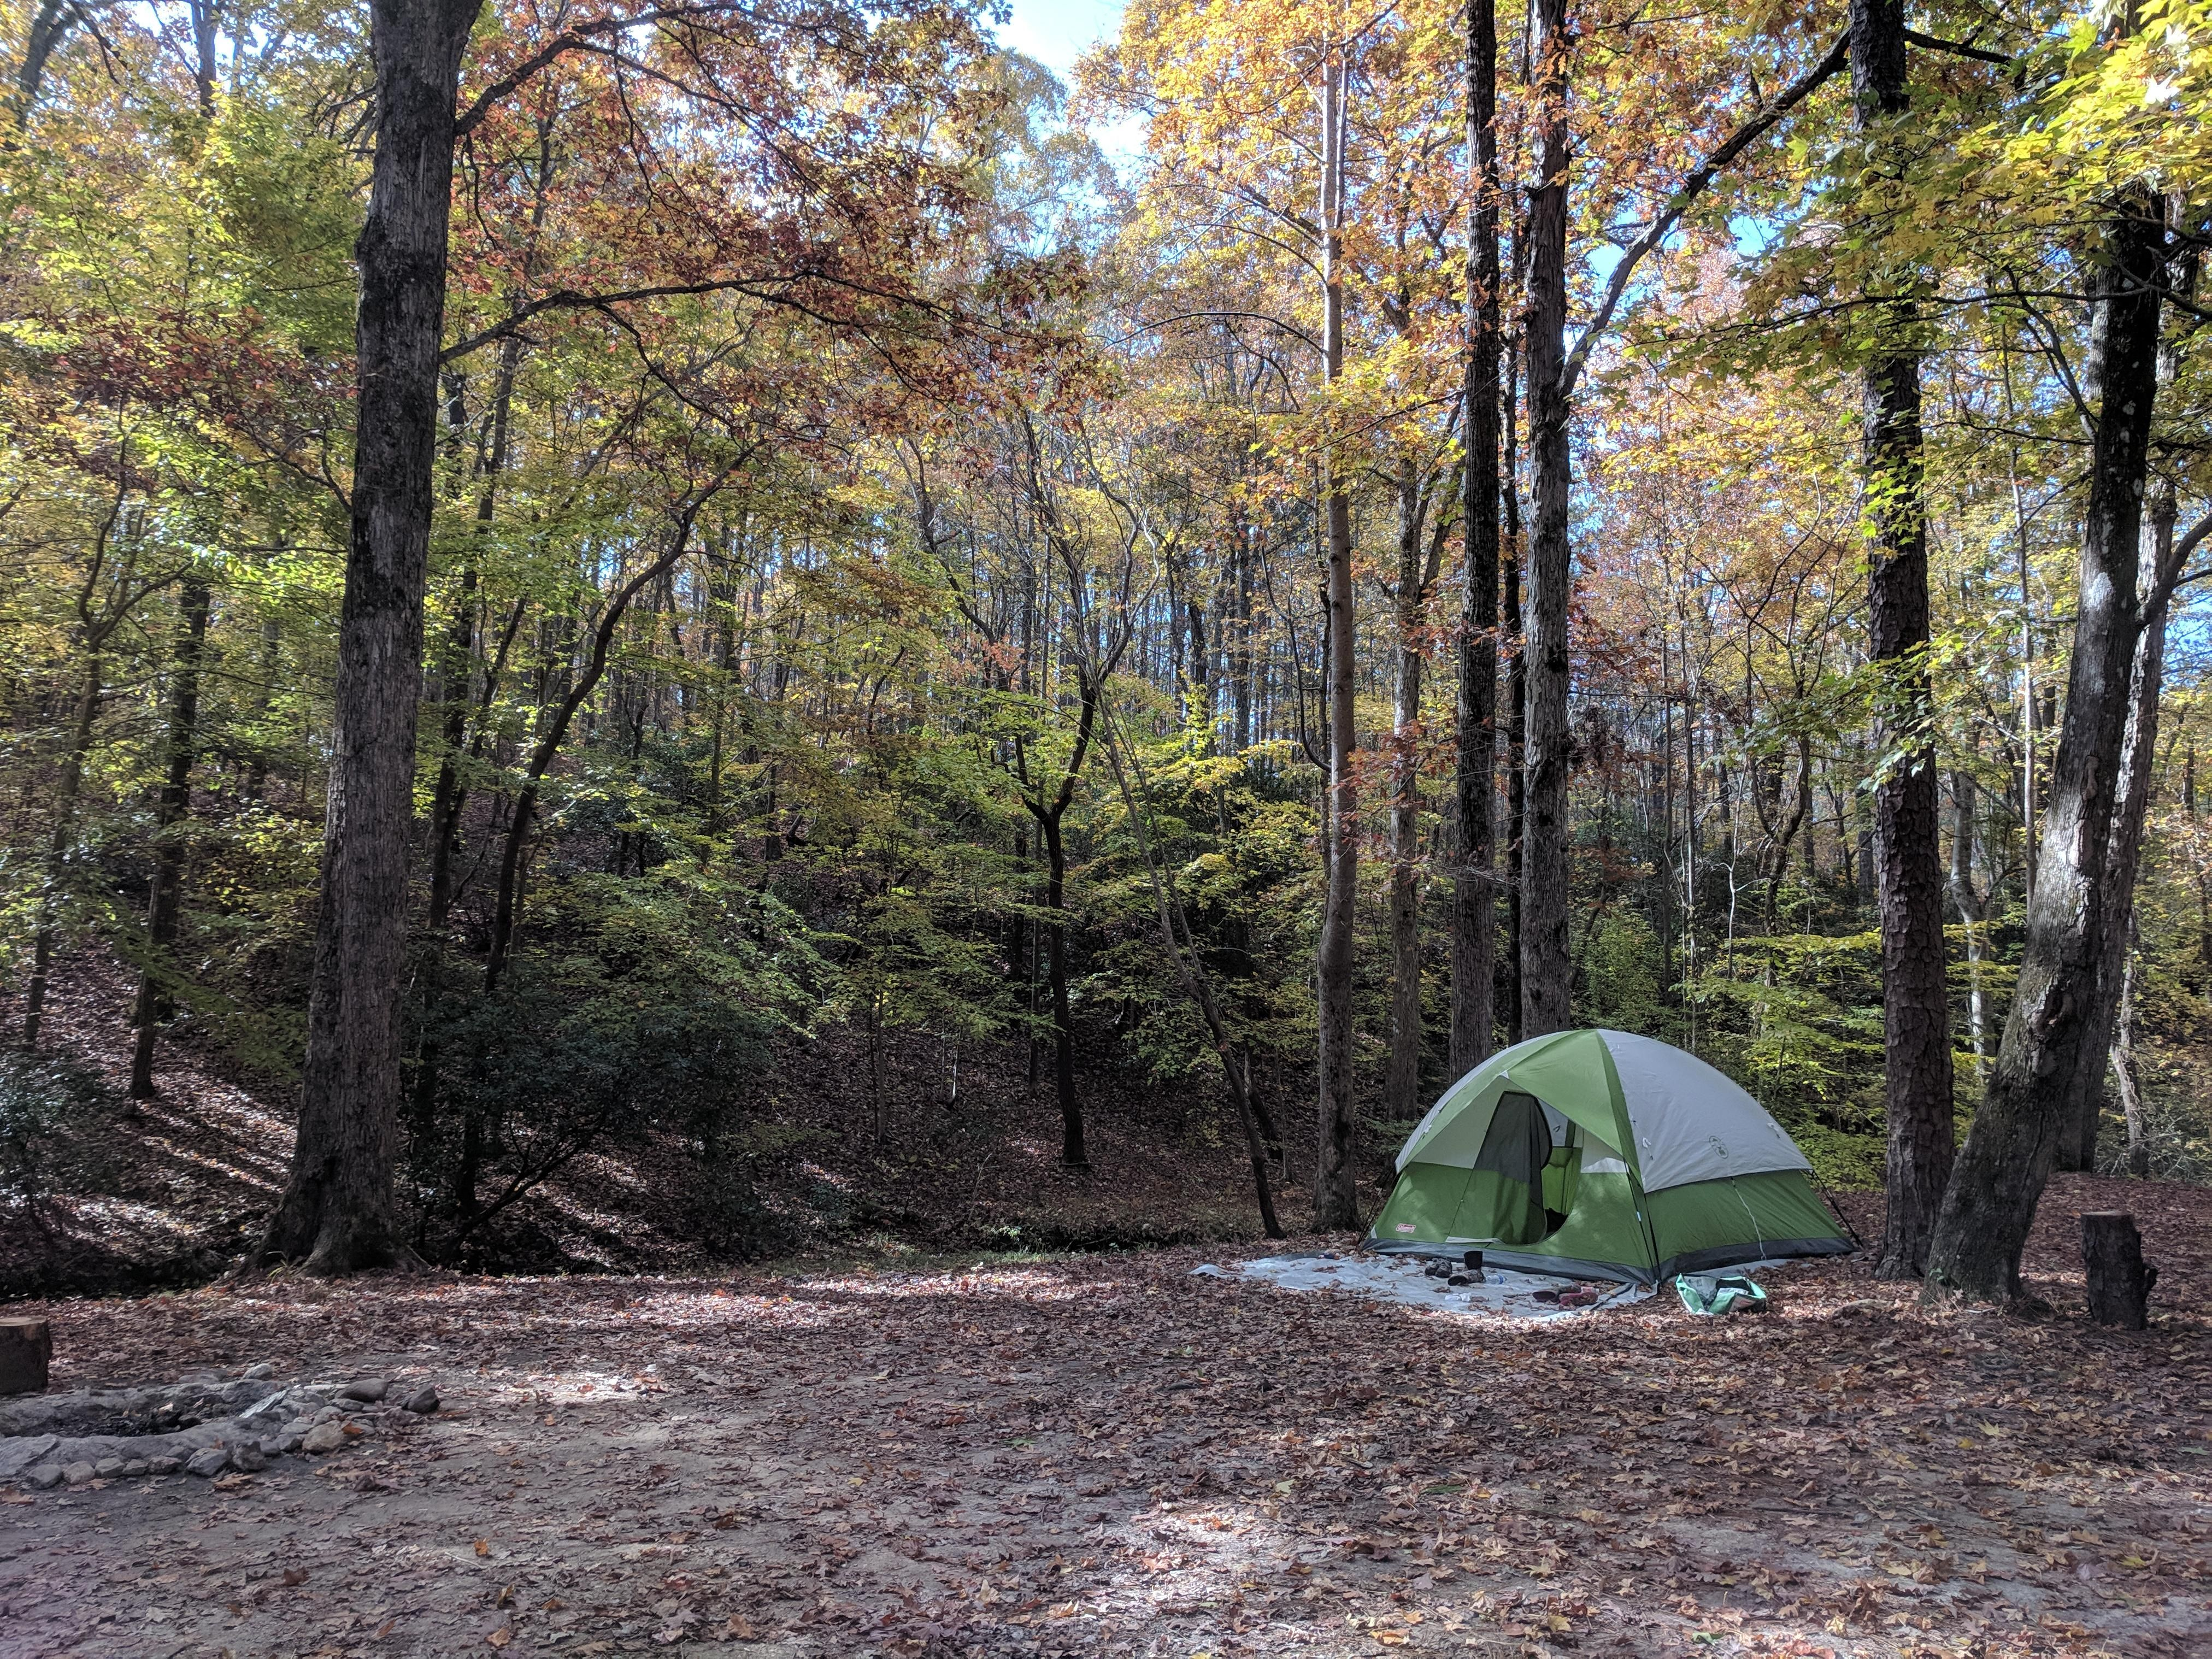 Camping in November near Cheaha State Park Alabama